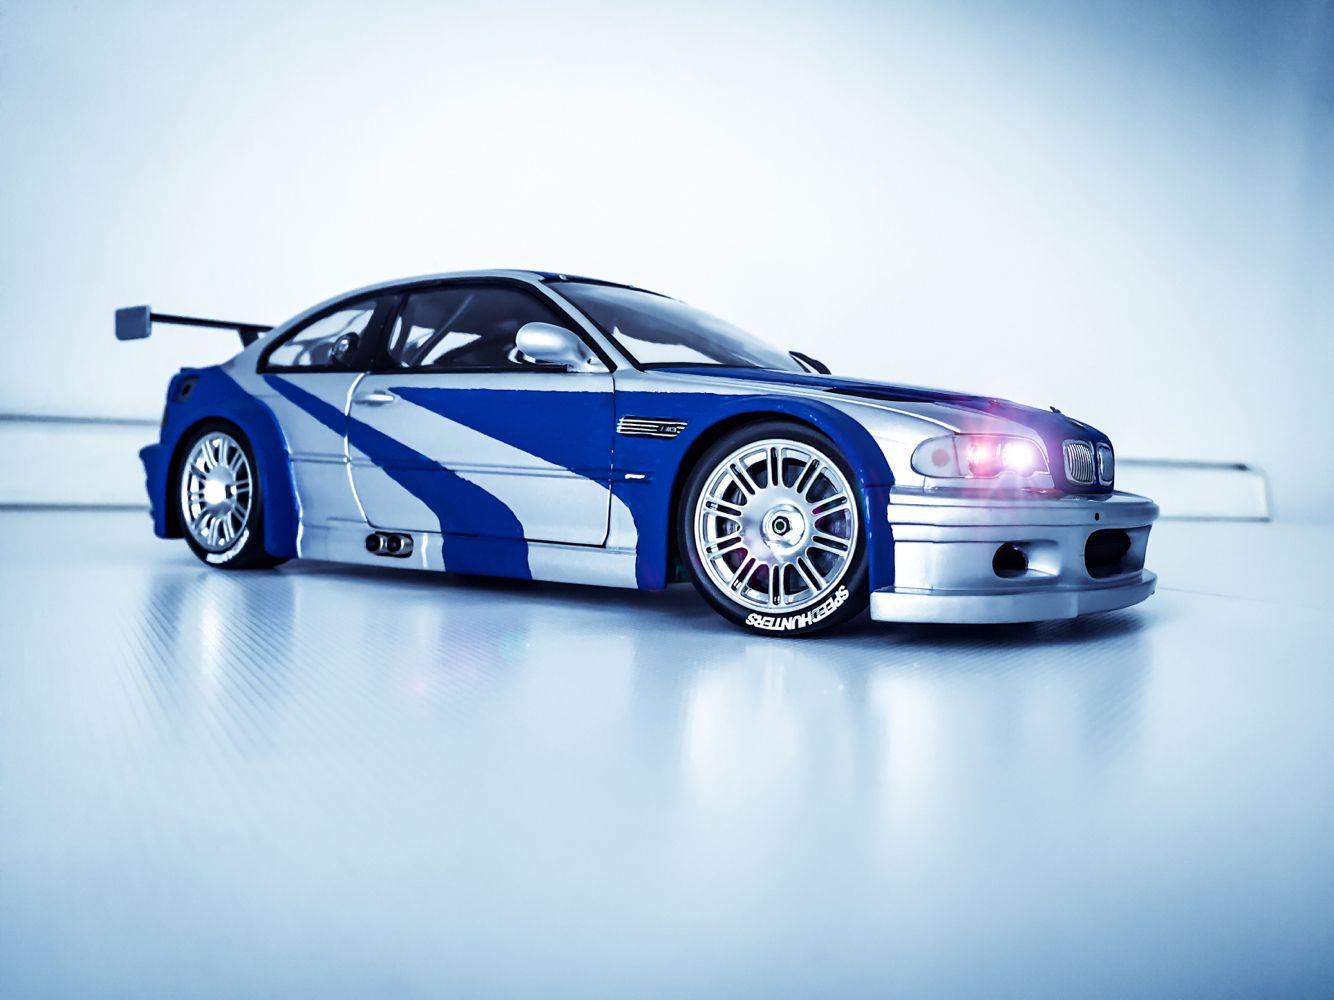 Bmw M3 Gtr Nfs With Images Bmw M3 Bmw Sport Cars